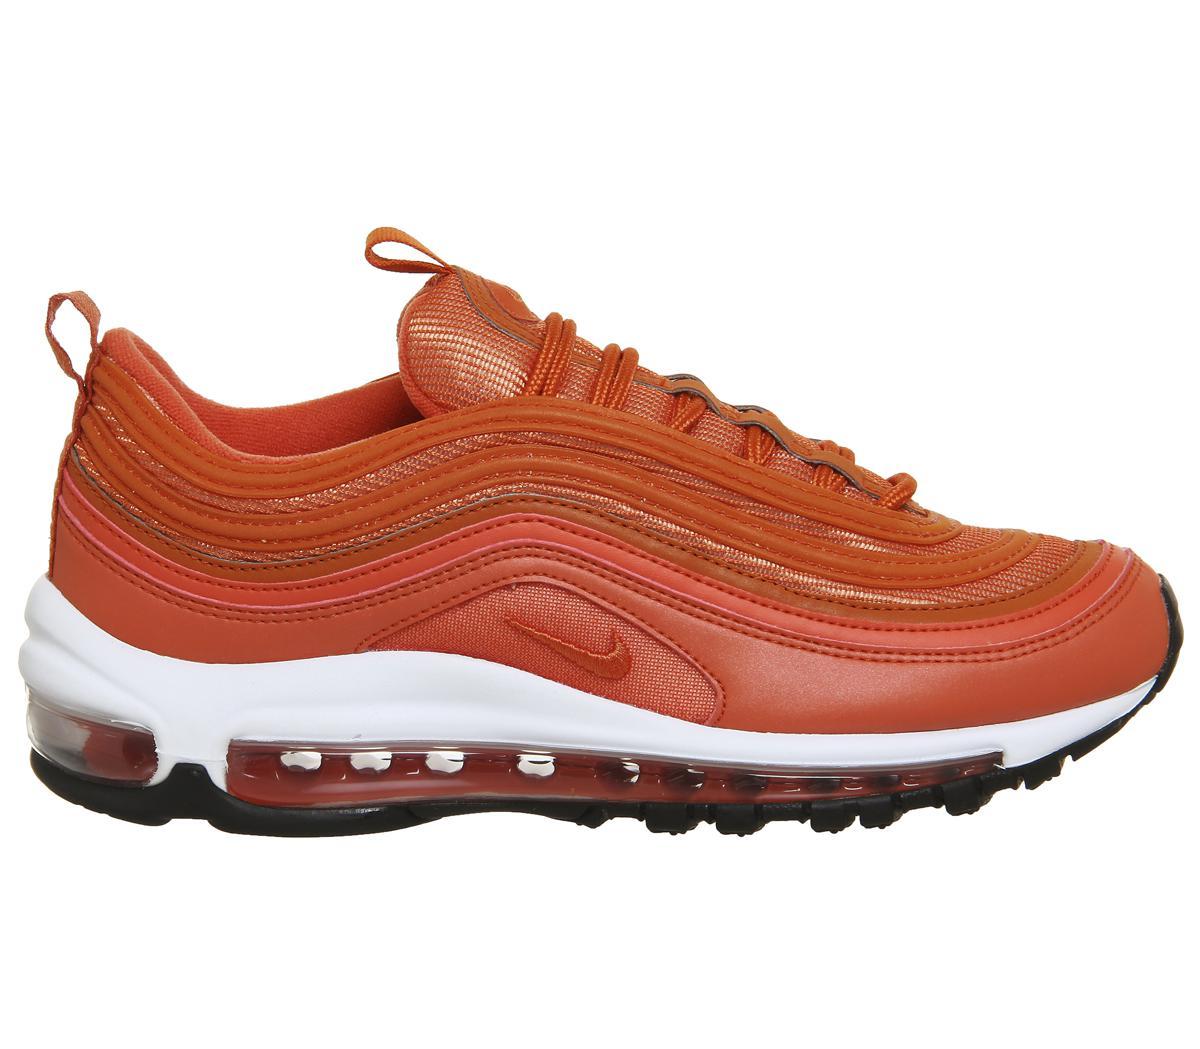 separation shoes 439d3 8ea32 Nike Orange Air Max 97 Trainers for men